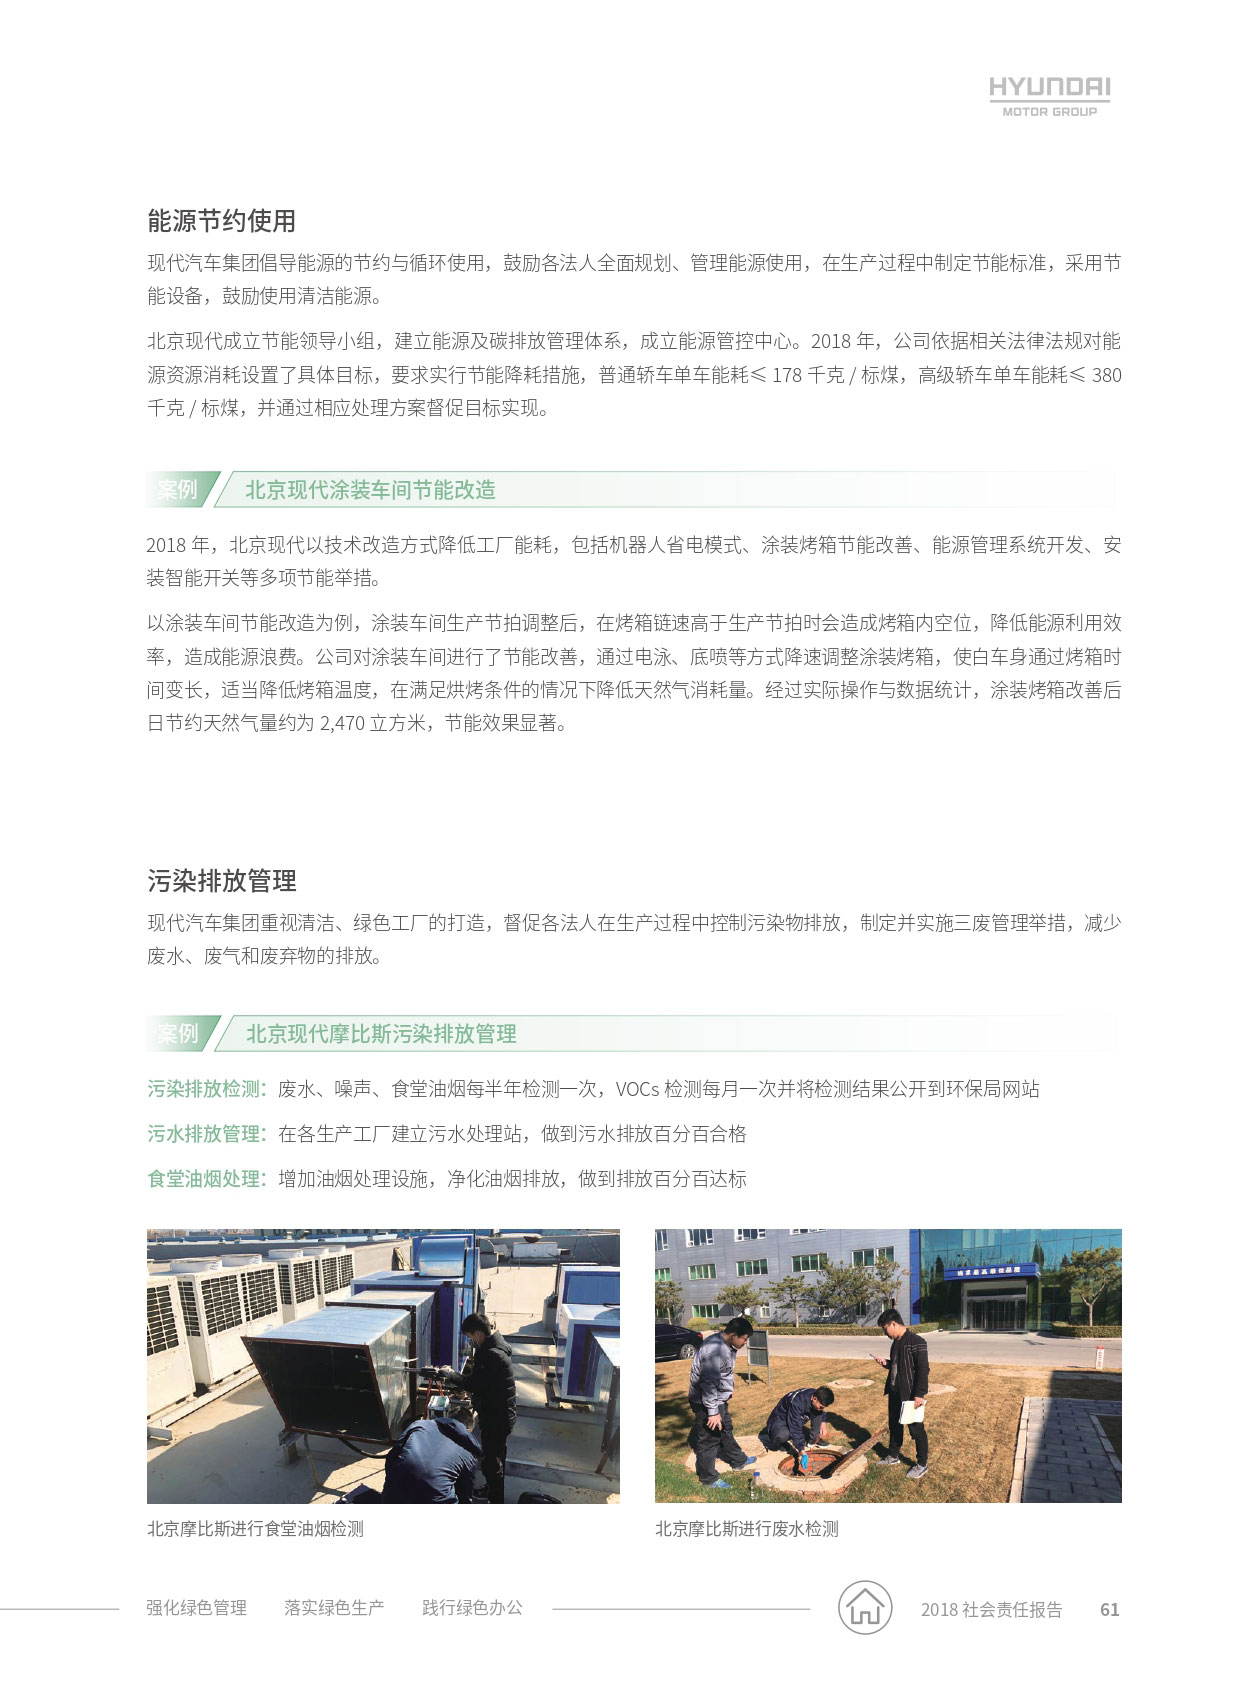 hyundai_china_csr_2018_page-0032_02